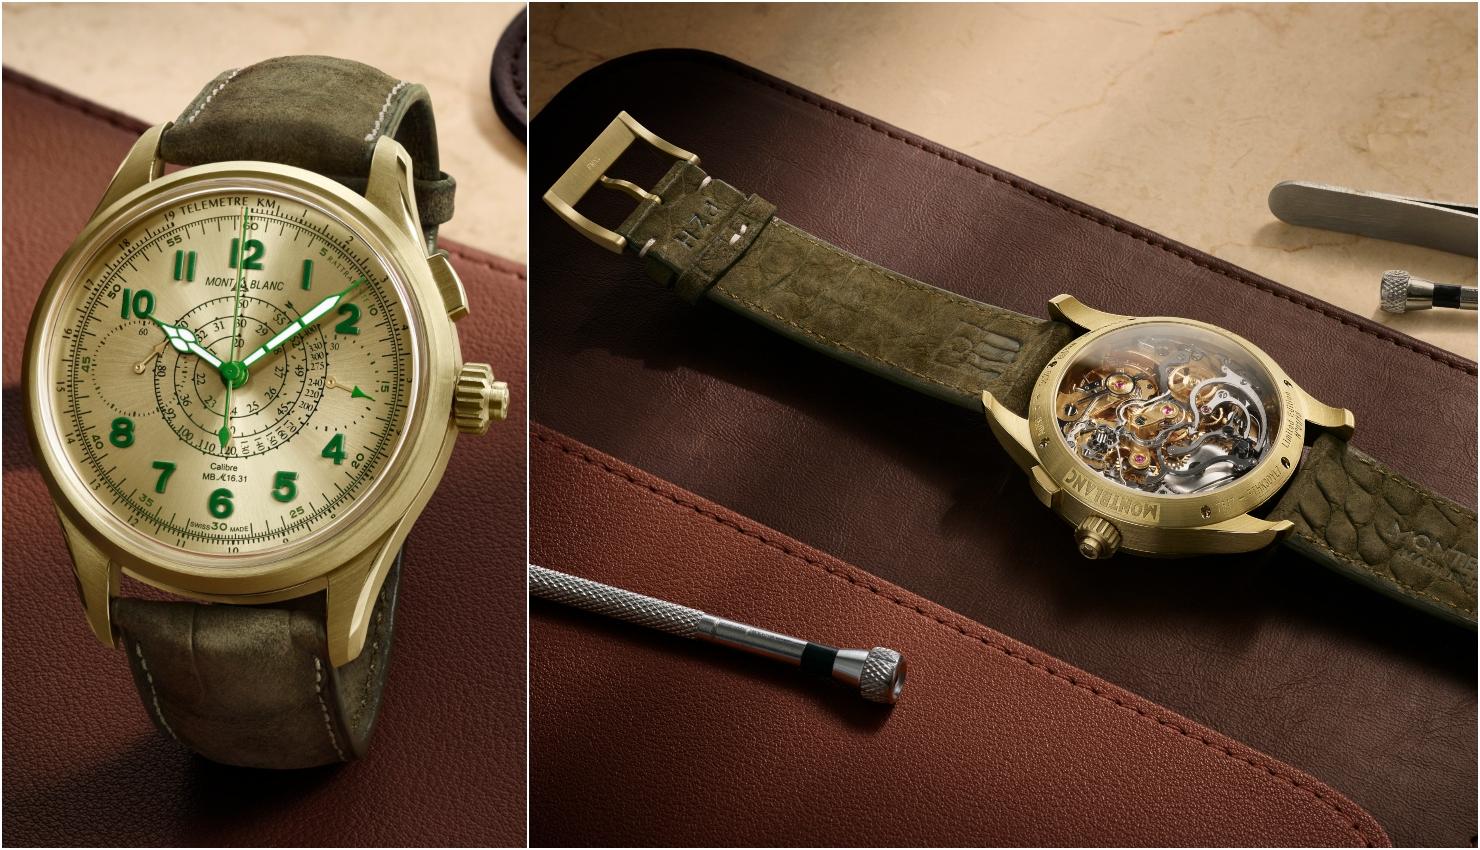 Novedades Relojes Hombres Montblanc